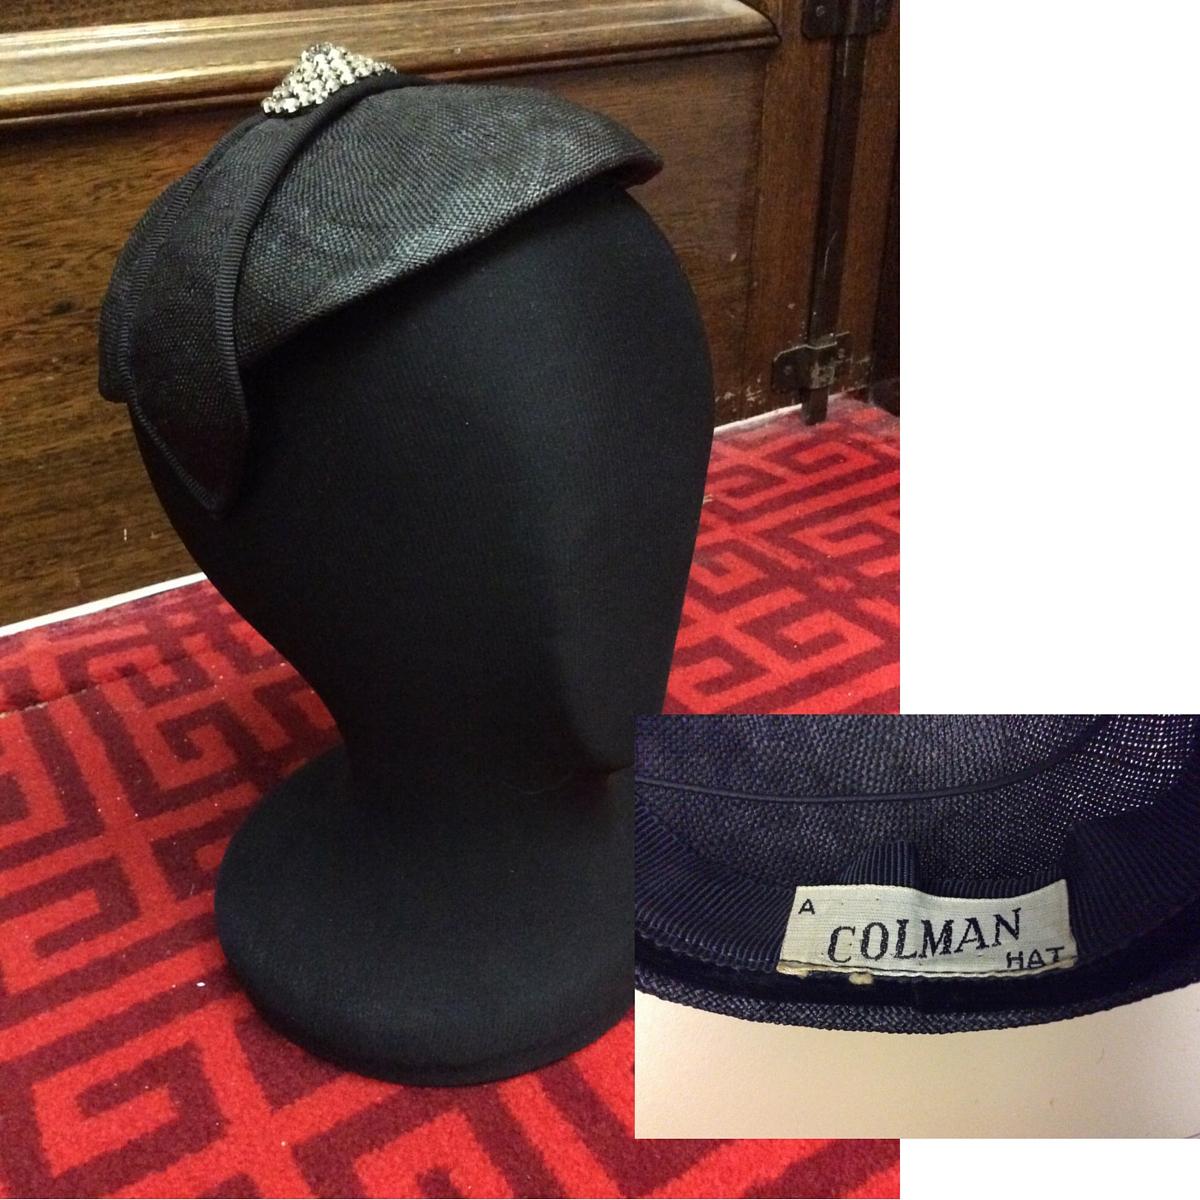 colman hat